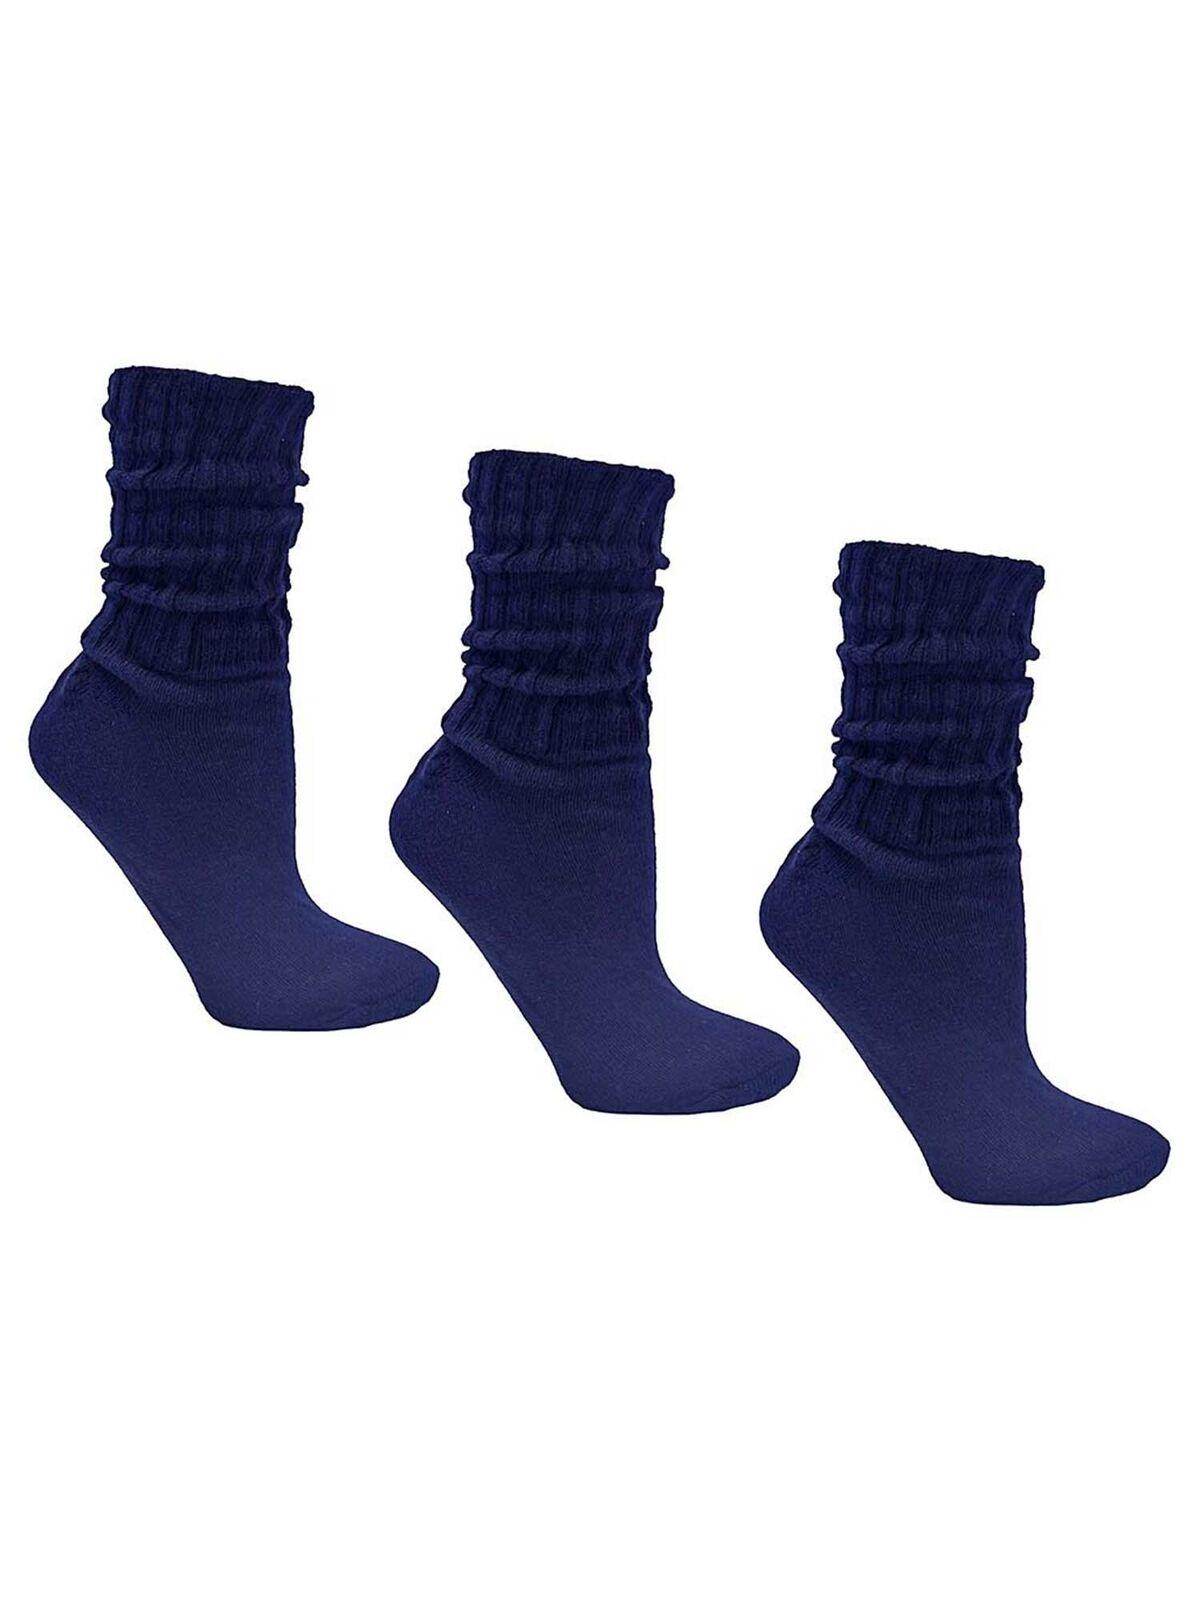 24 PAIRS WOMEN FOOTLOCKER SLOUCH SOCKS WOMEN SHOES SIZE 9-13 WHITE COTTON 85/%